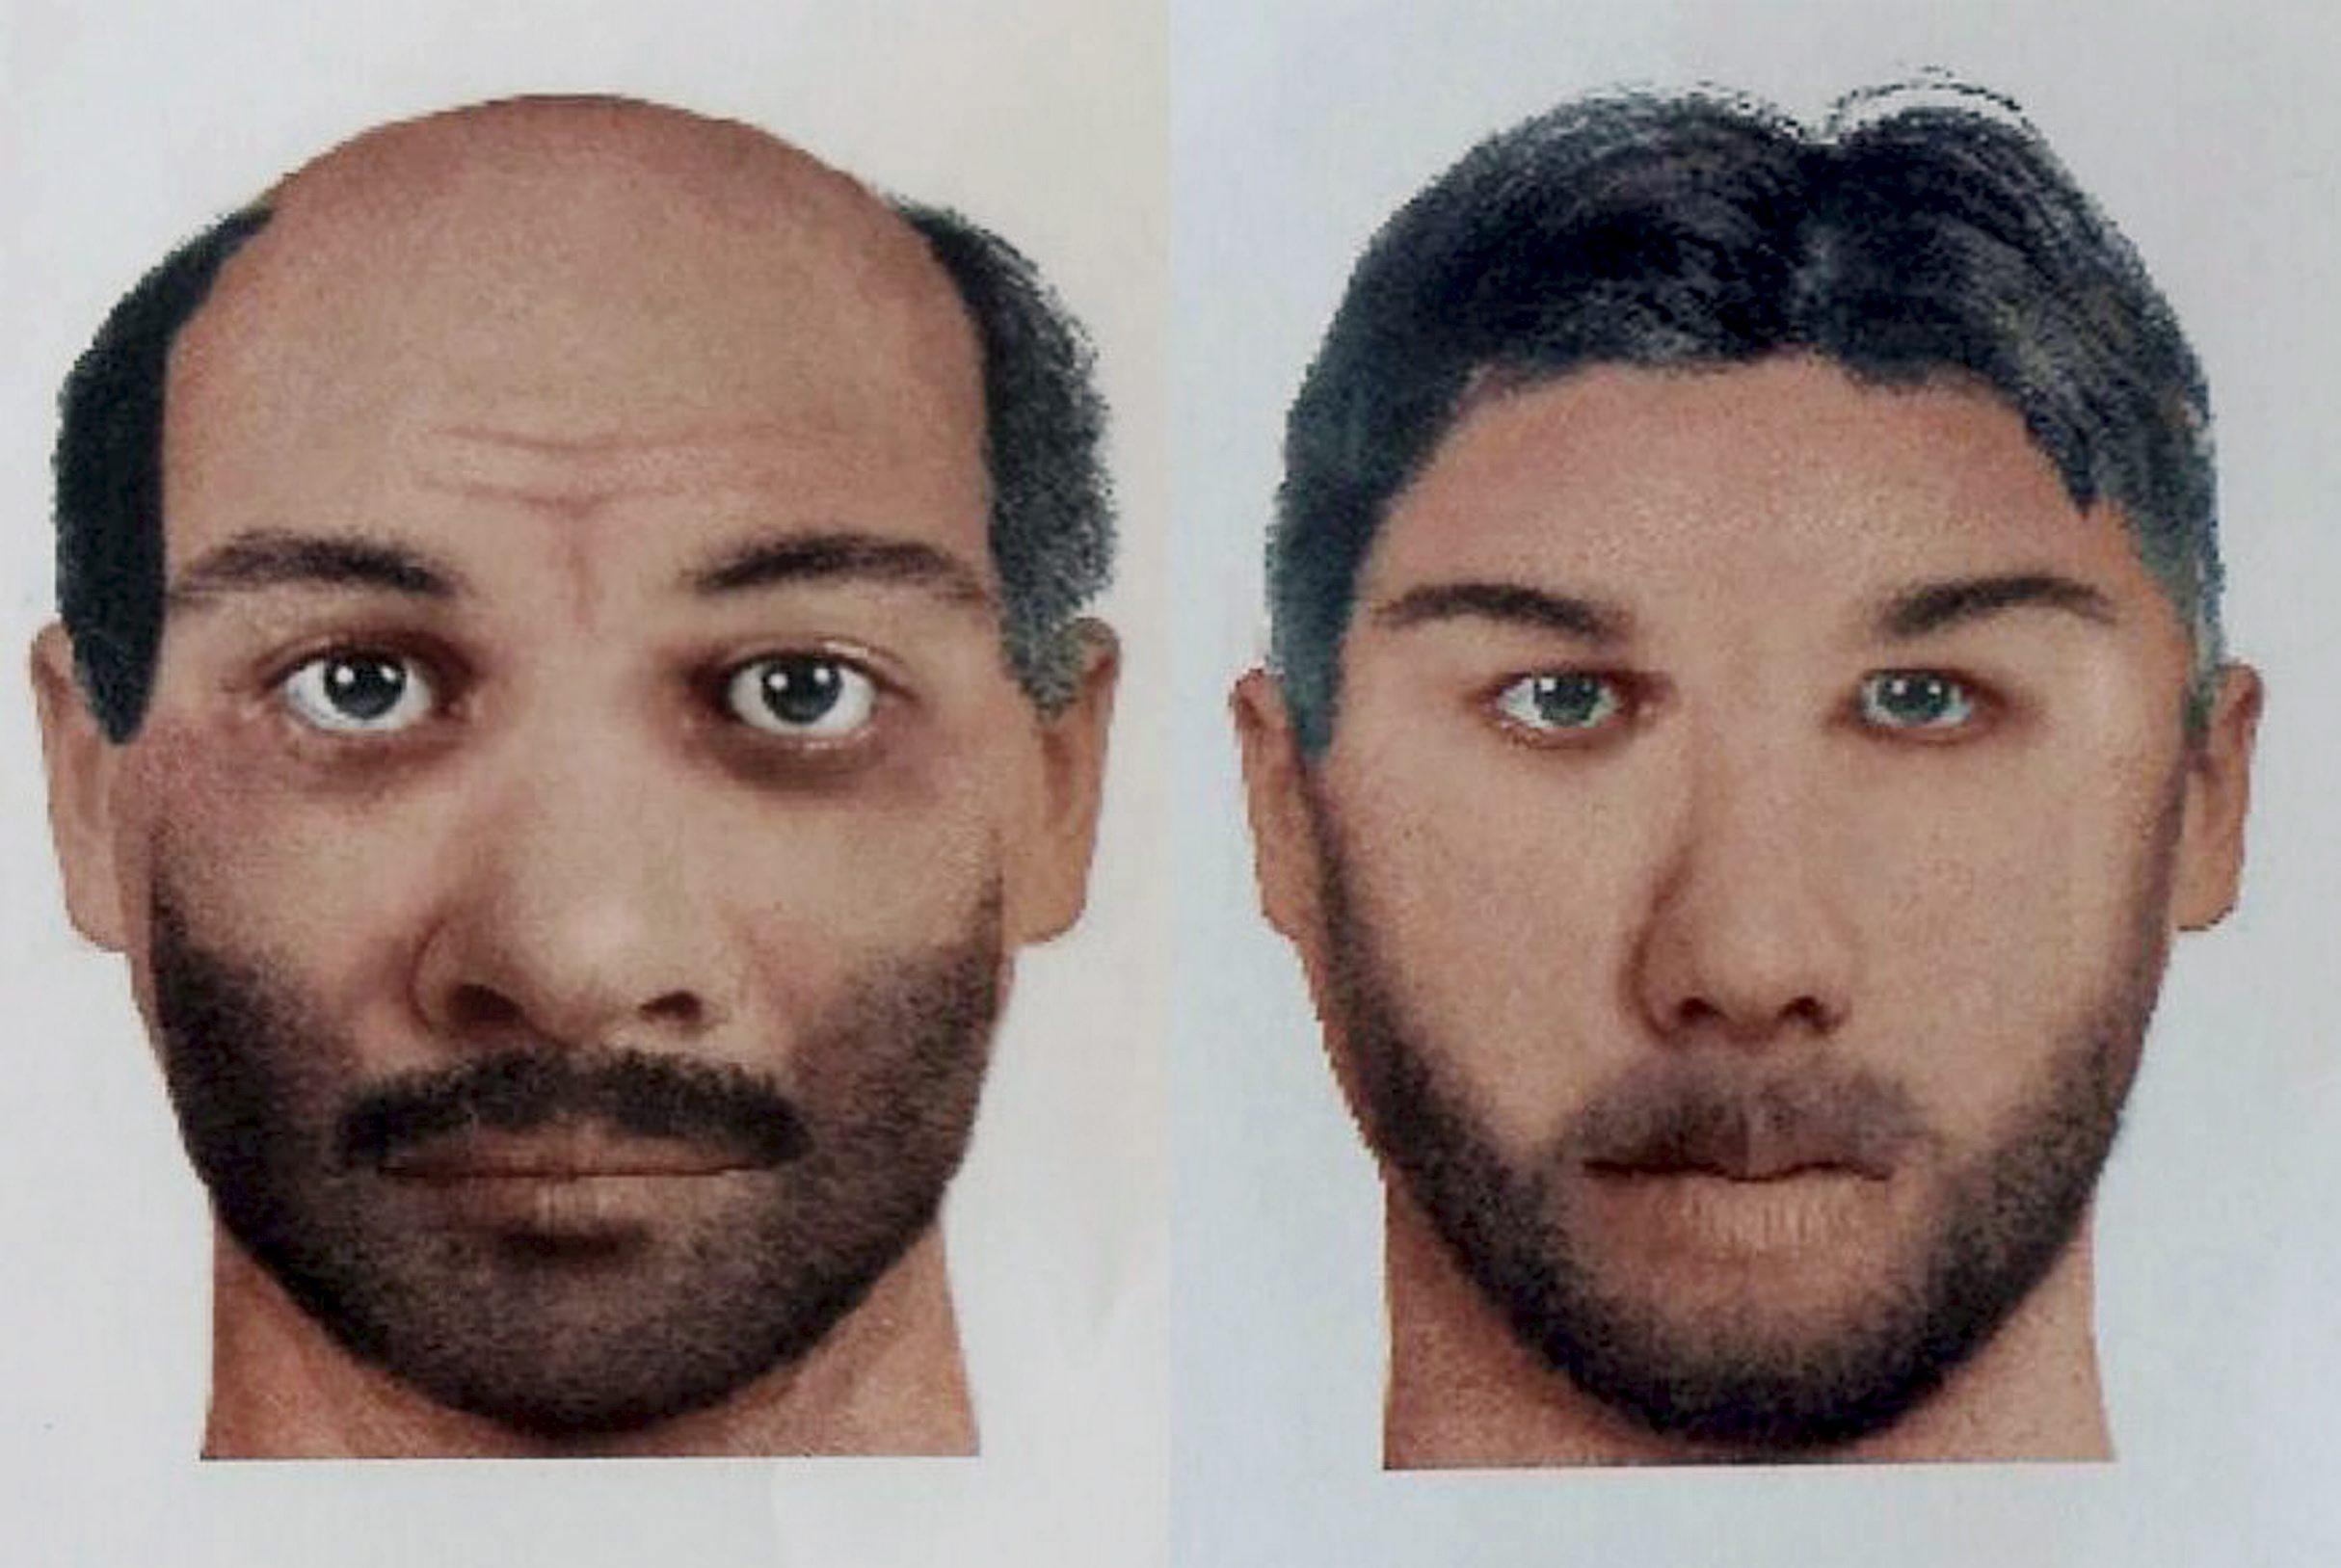 nia terror suspects